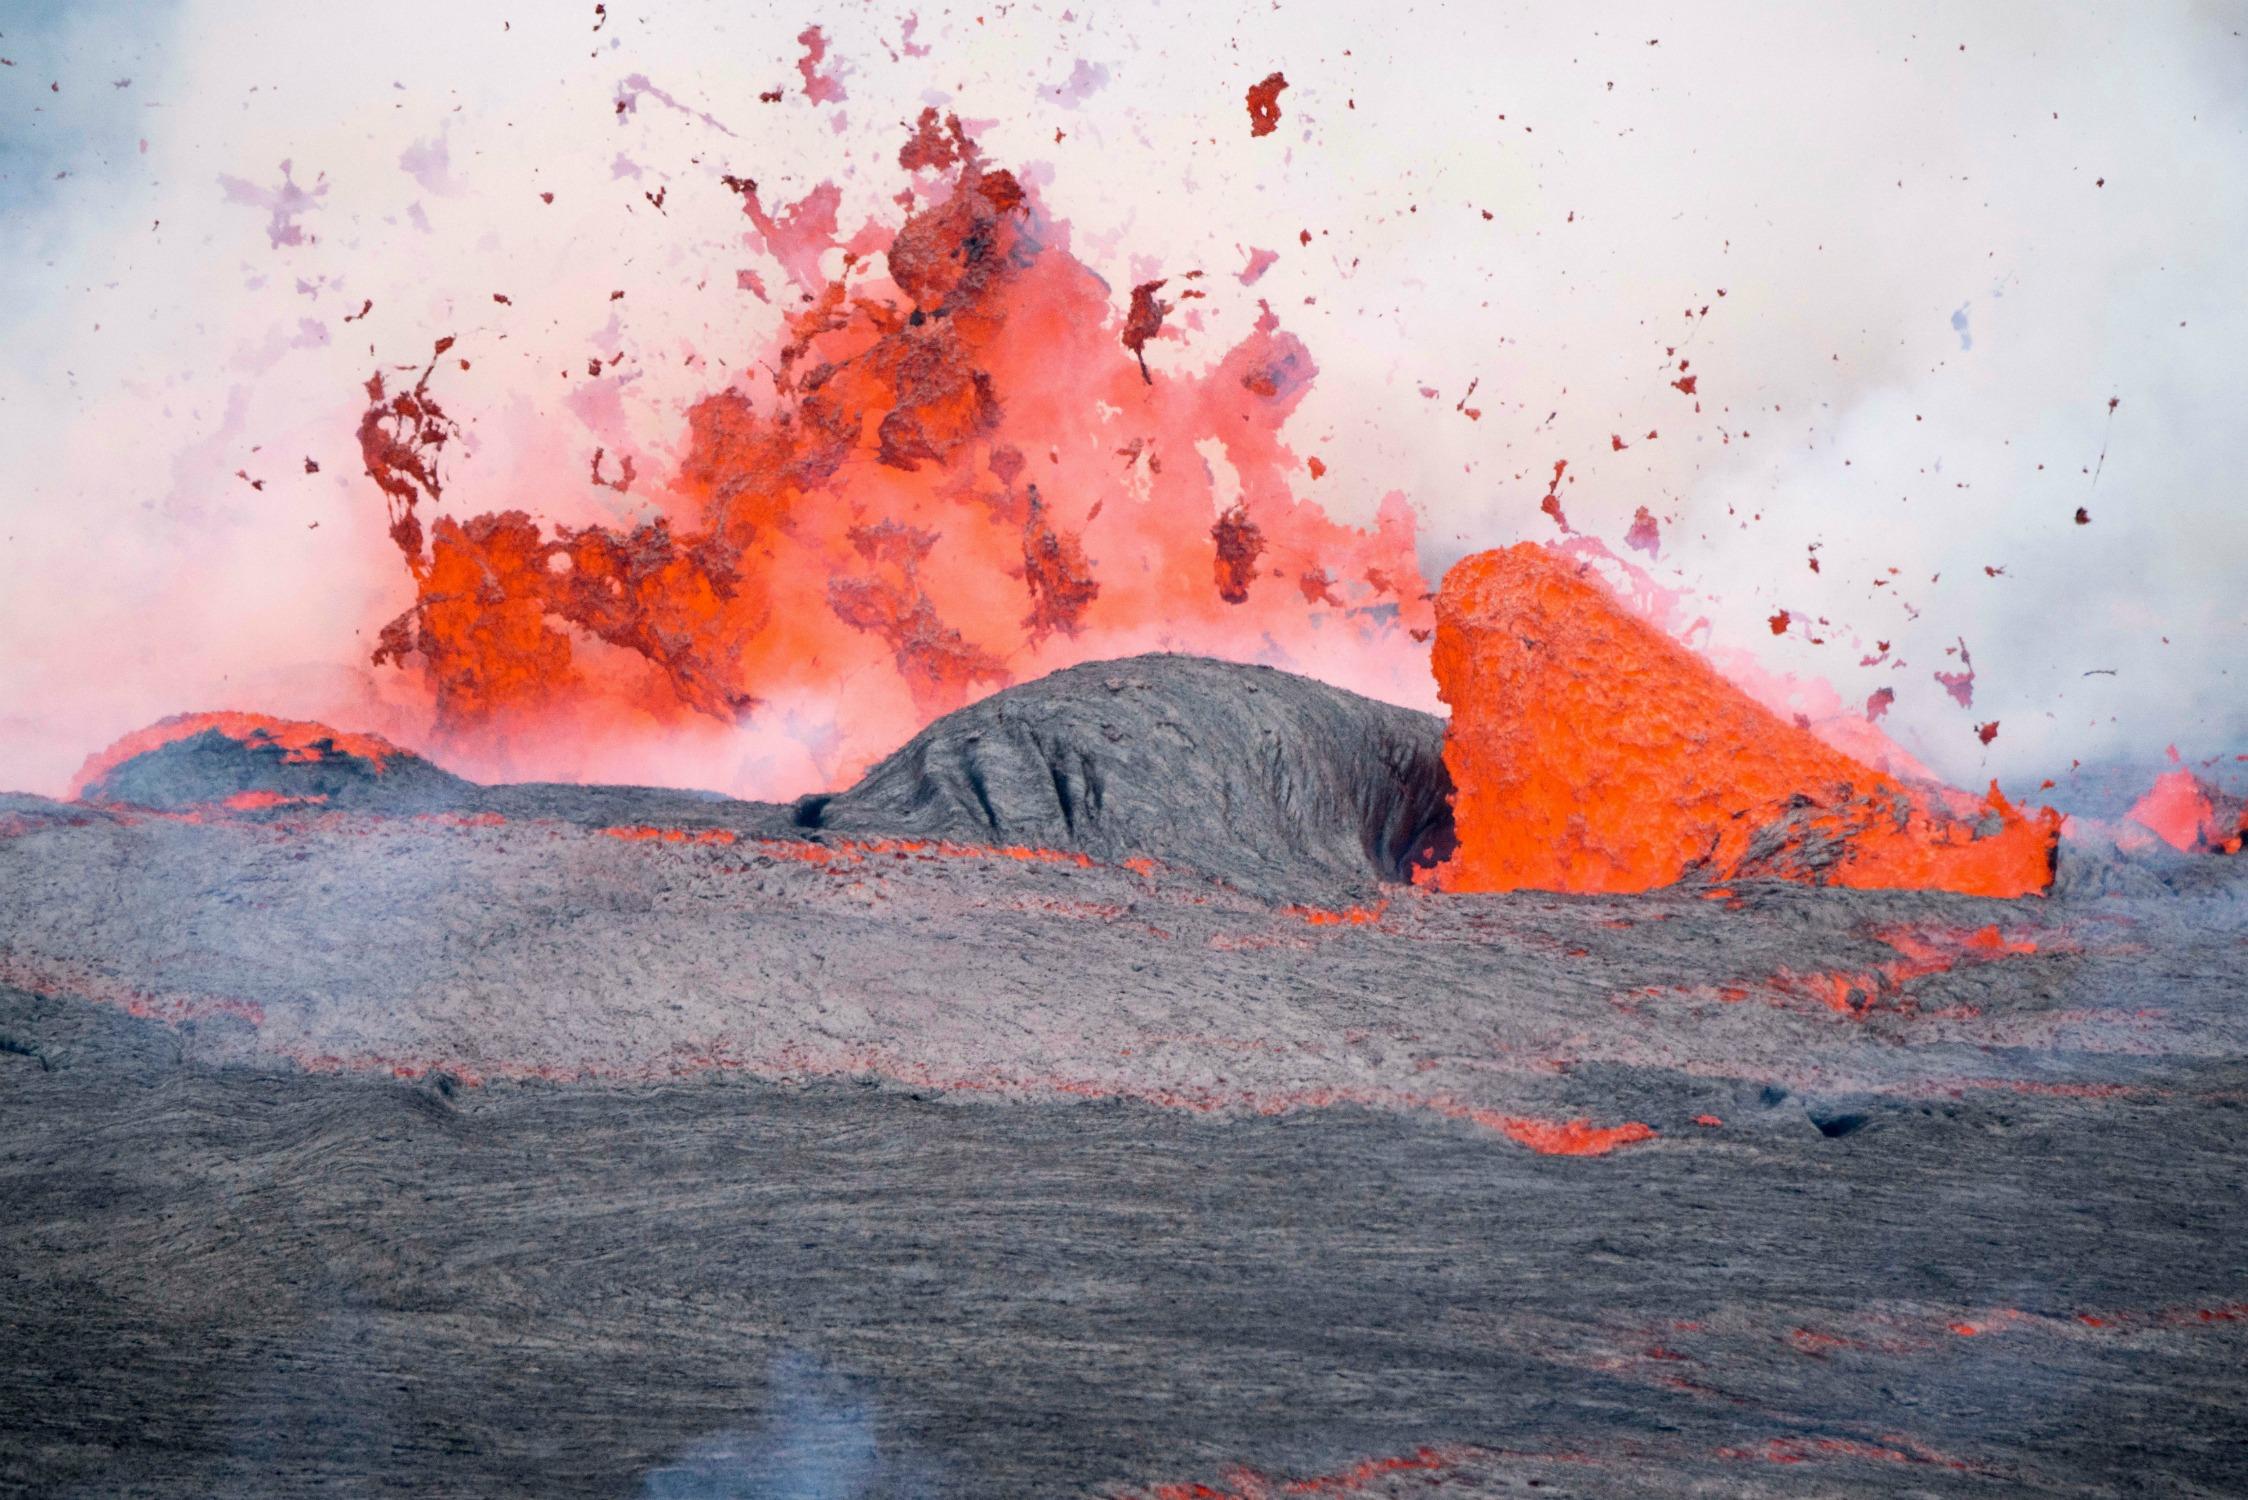 location-volcanolava.jpg